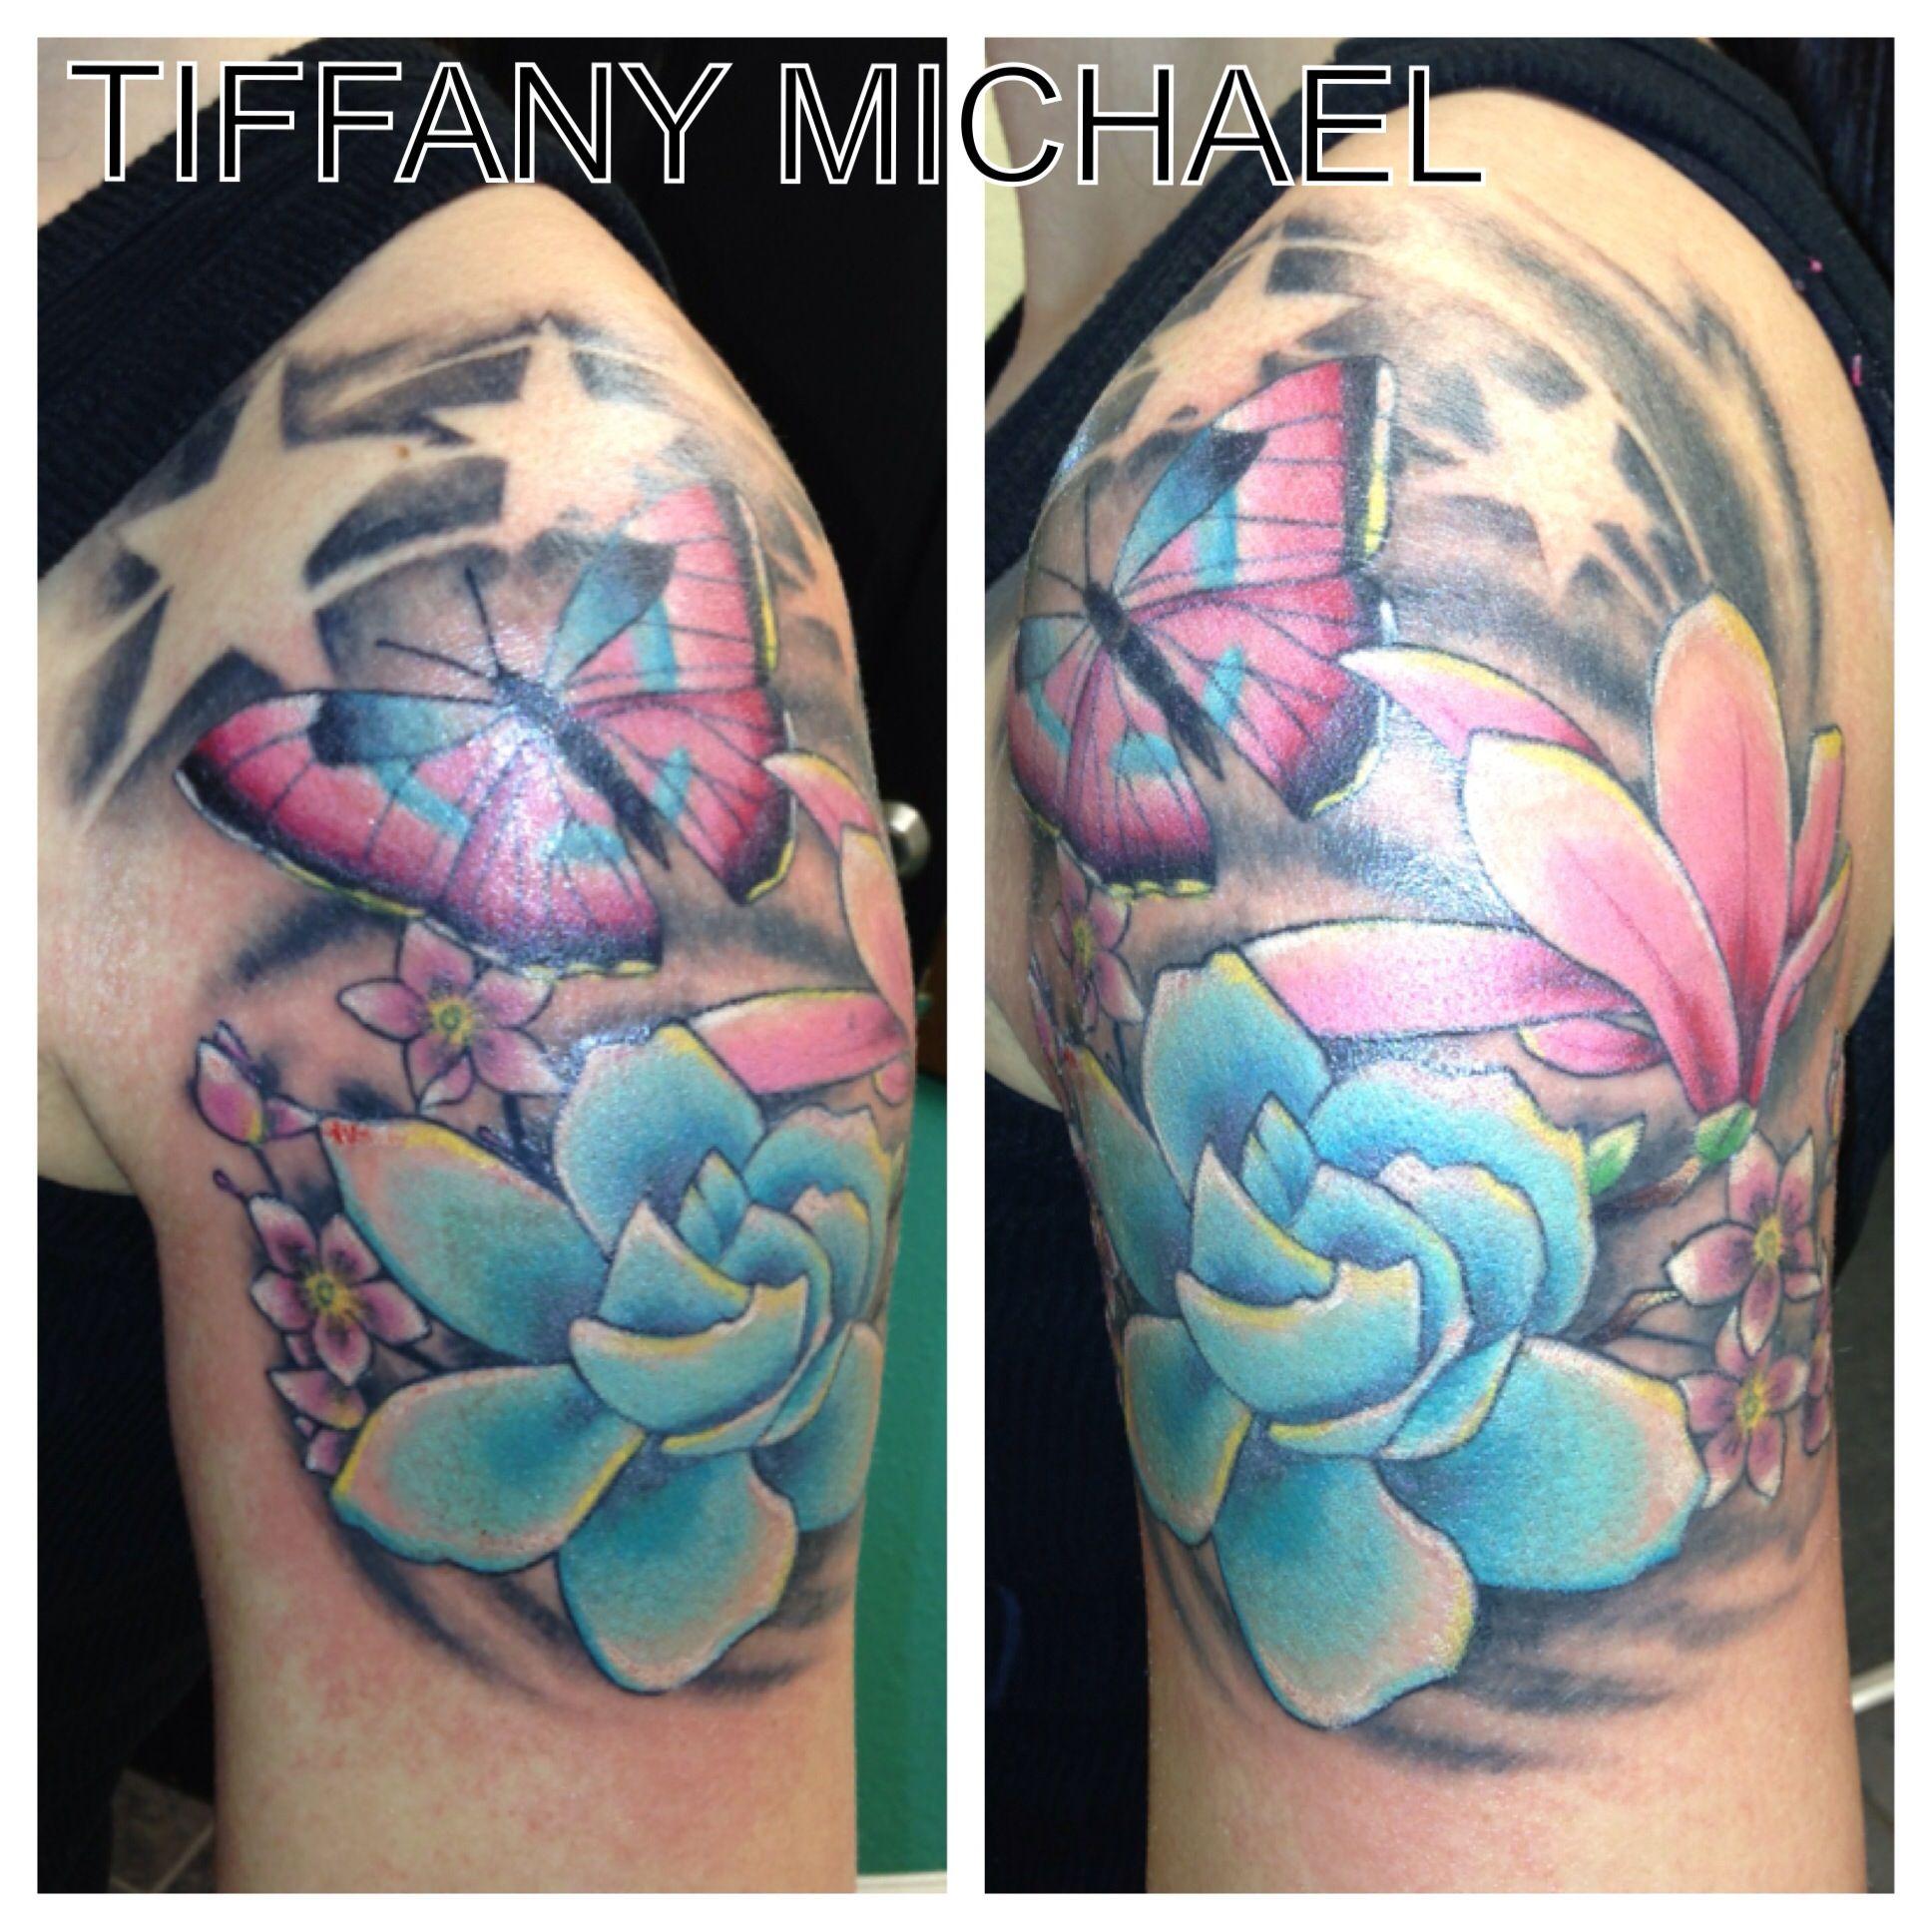 Chest To 1 4 Sleeve Koi Fish And Lotus Tattoo: Tattoos, Arm Sleeve Tattoos